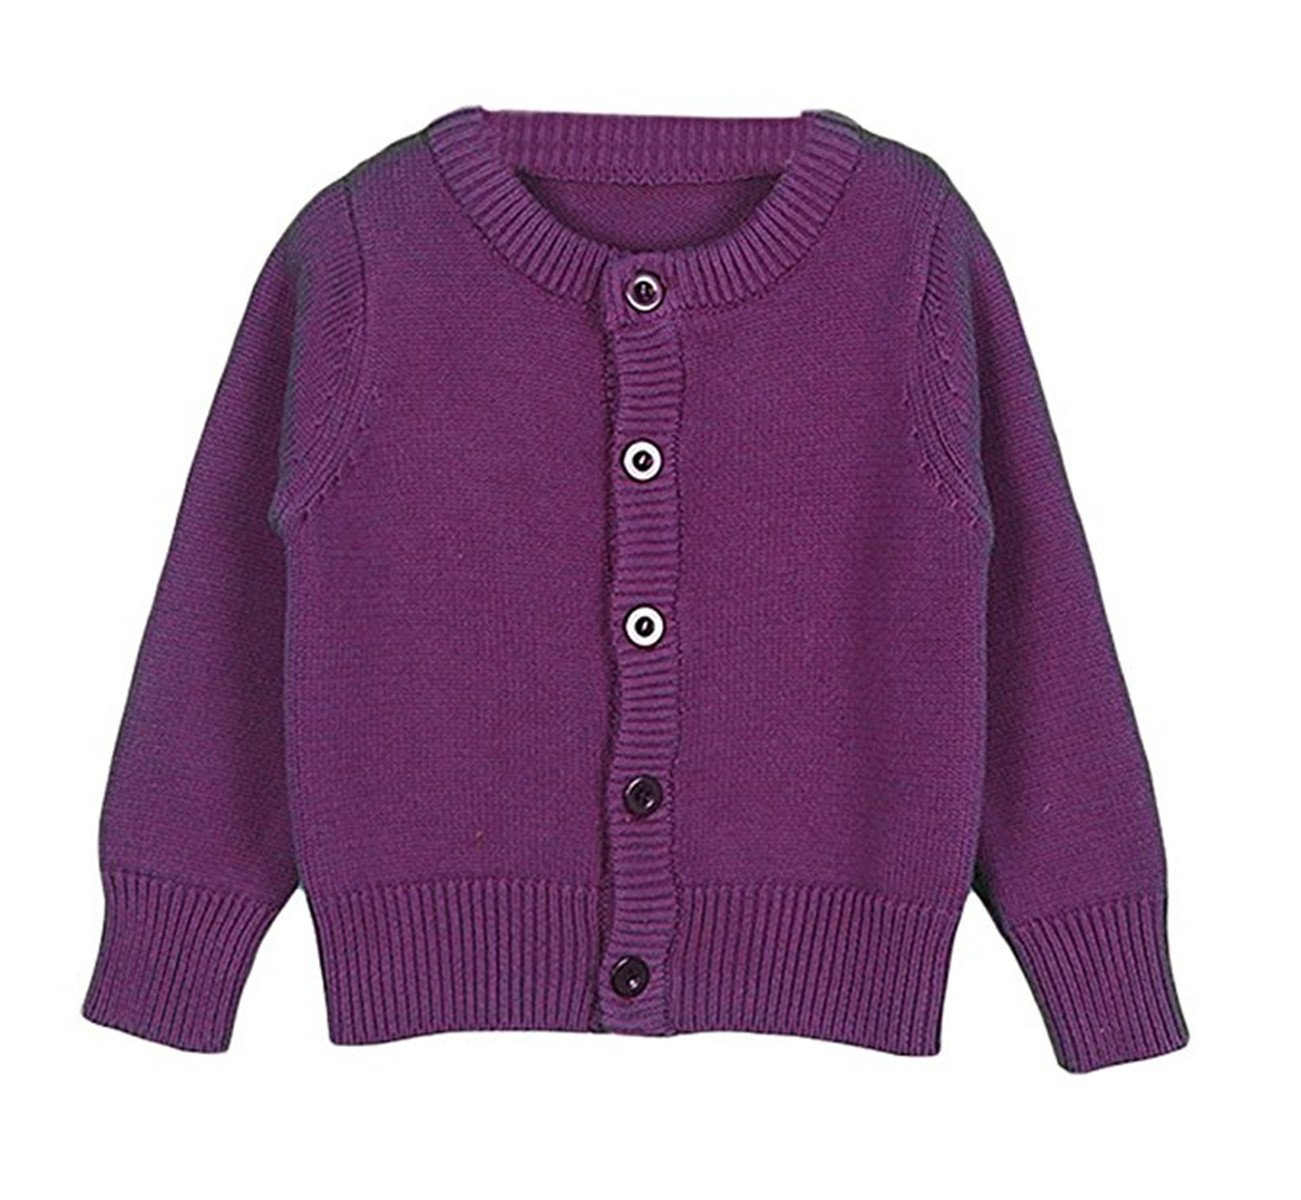 REWANGOING Baby Little Girls Long Sleeve Spring Autumn Knit Cardigan Front Button Sweater 4T